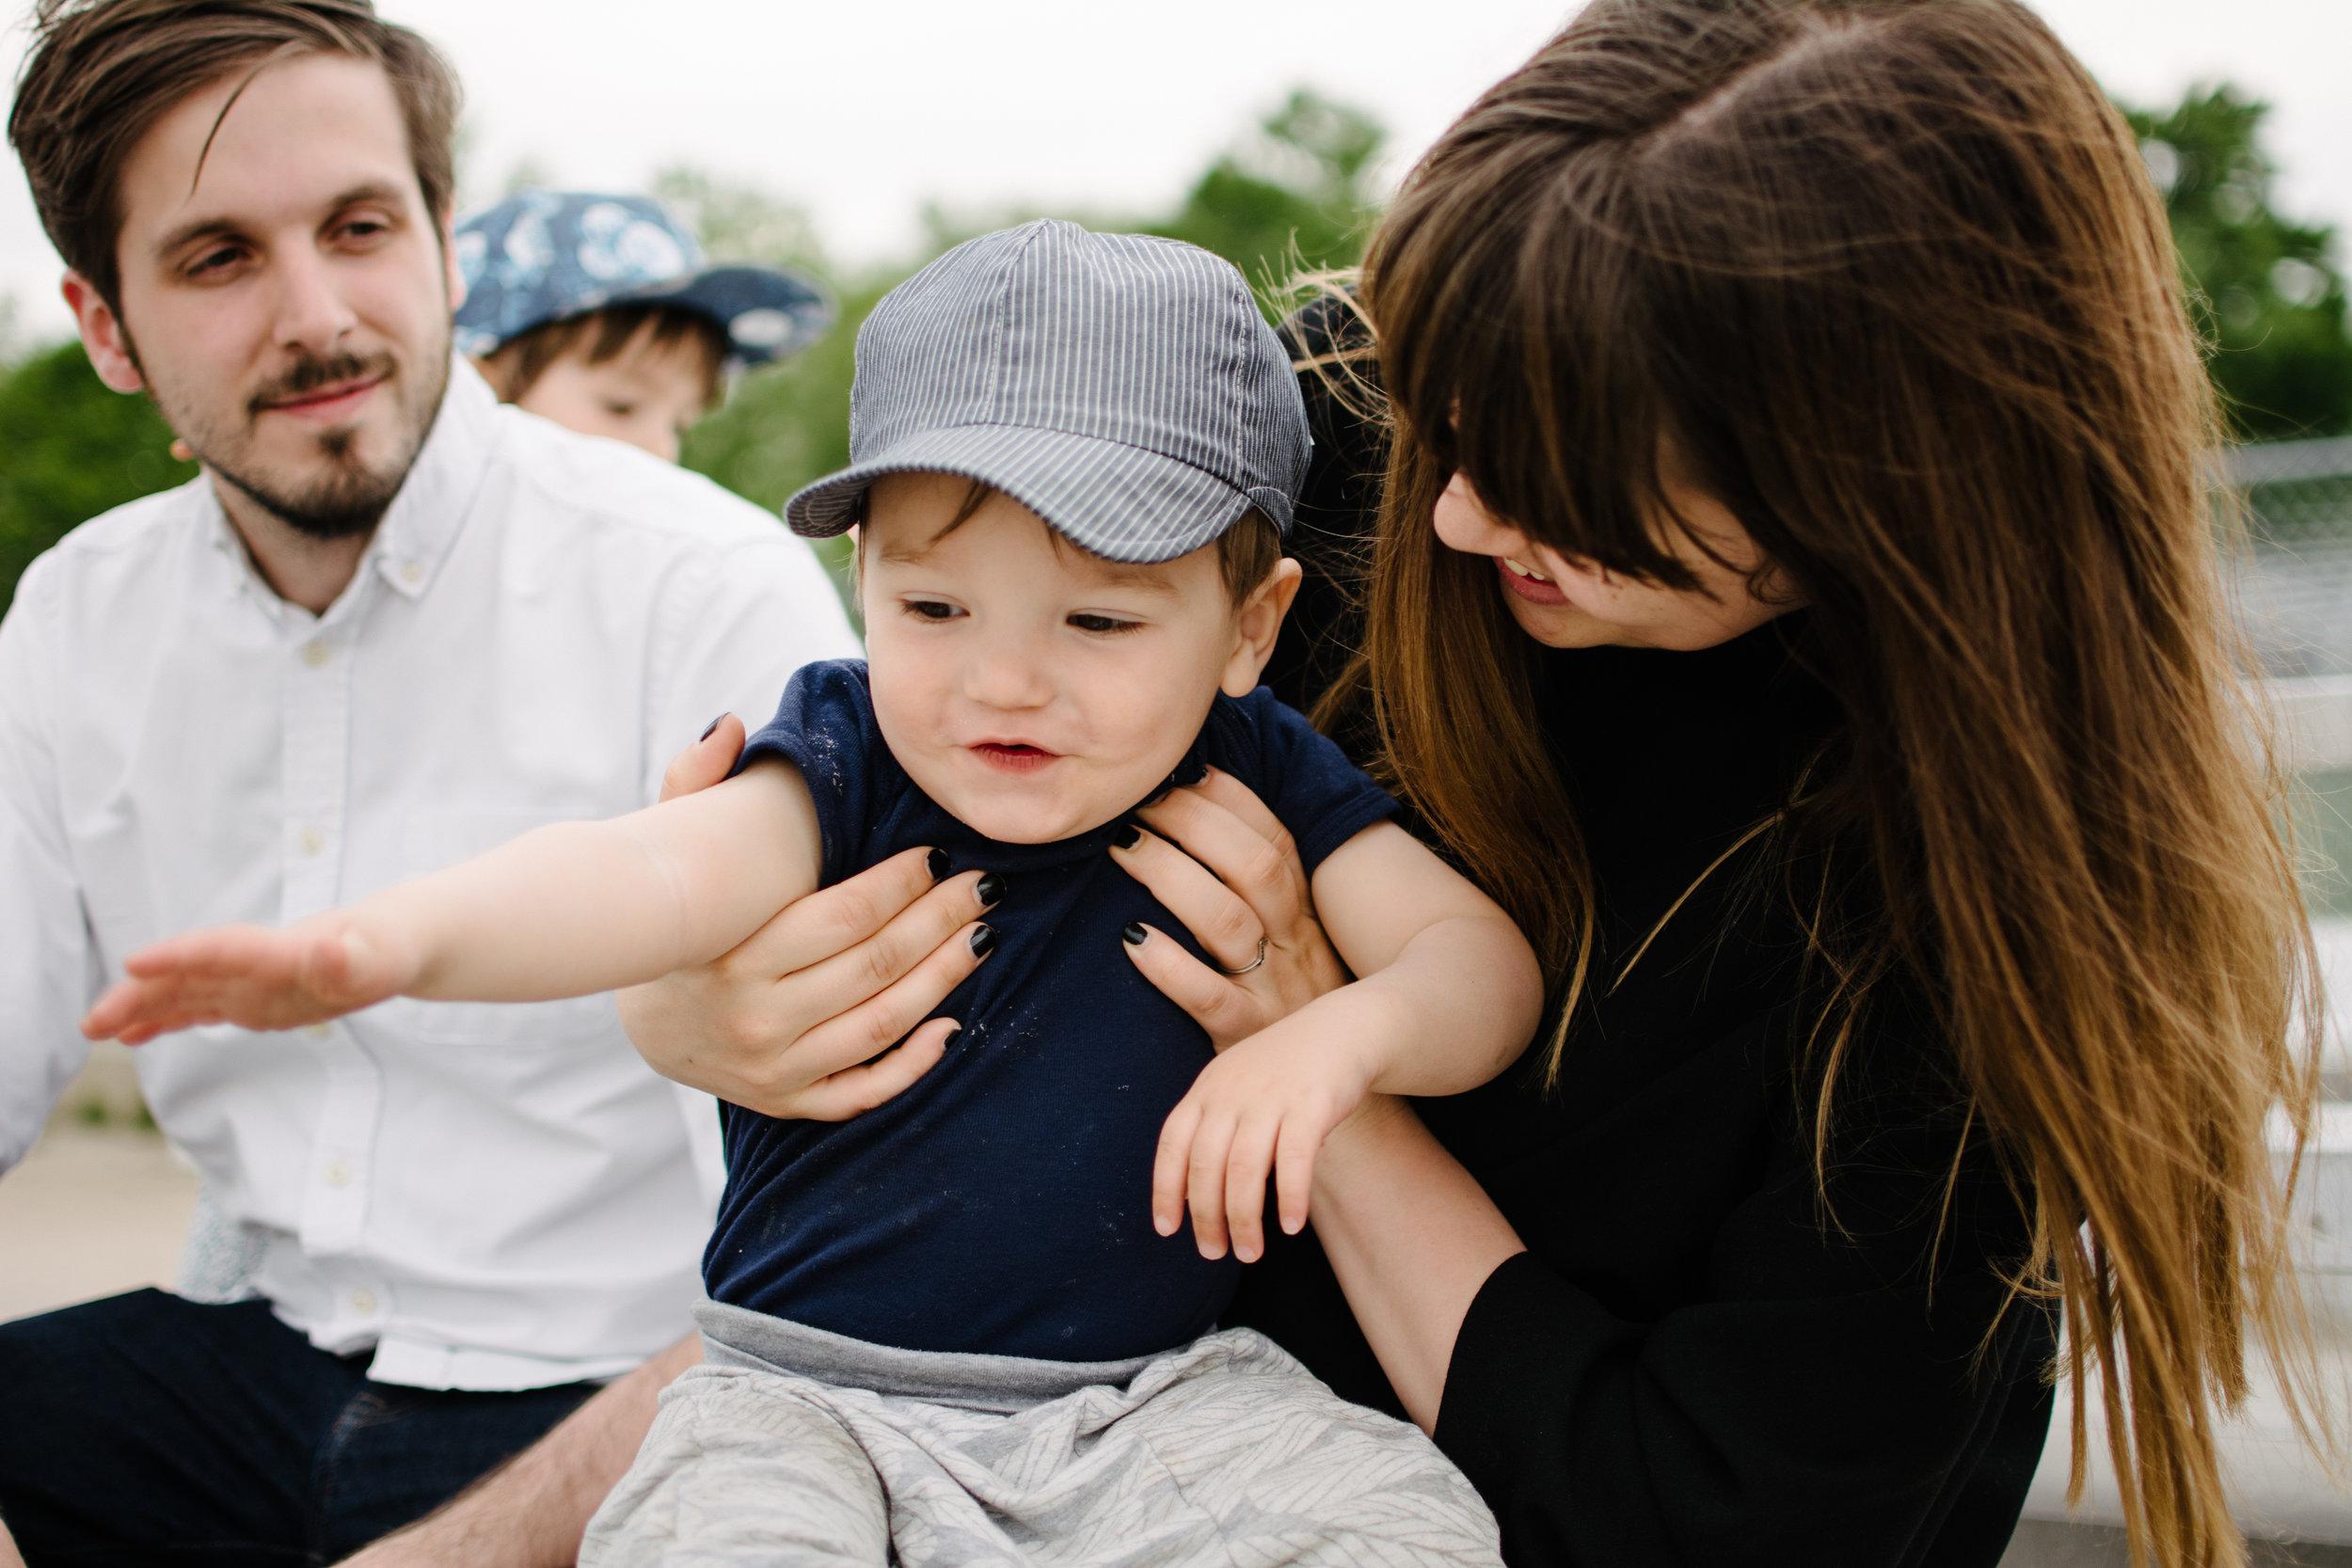 ete_photographe-famille-lifestyle-montreal-3.jpg